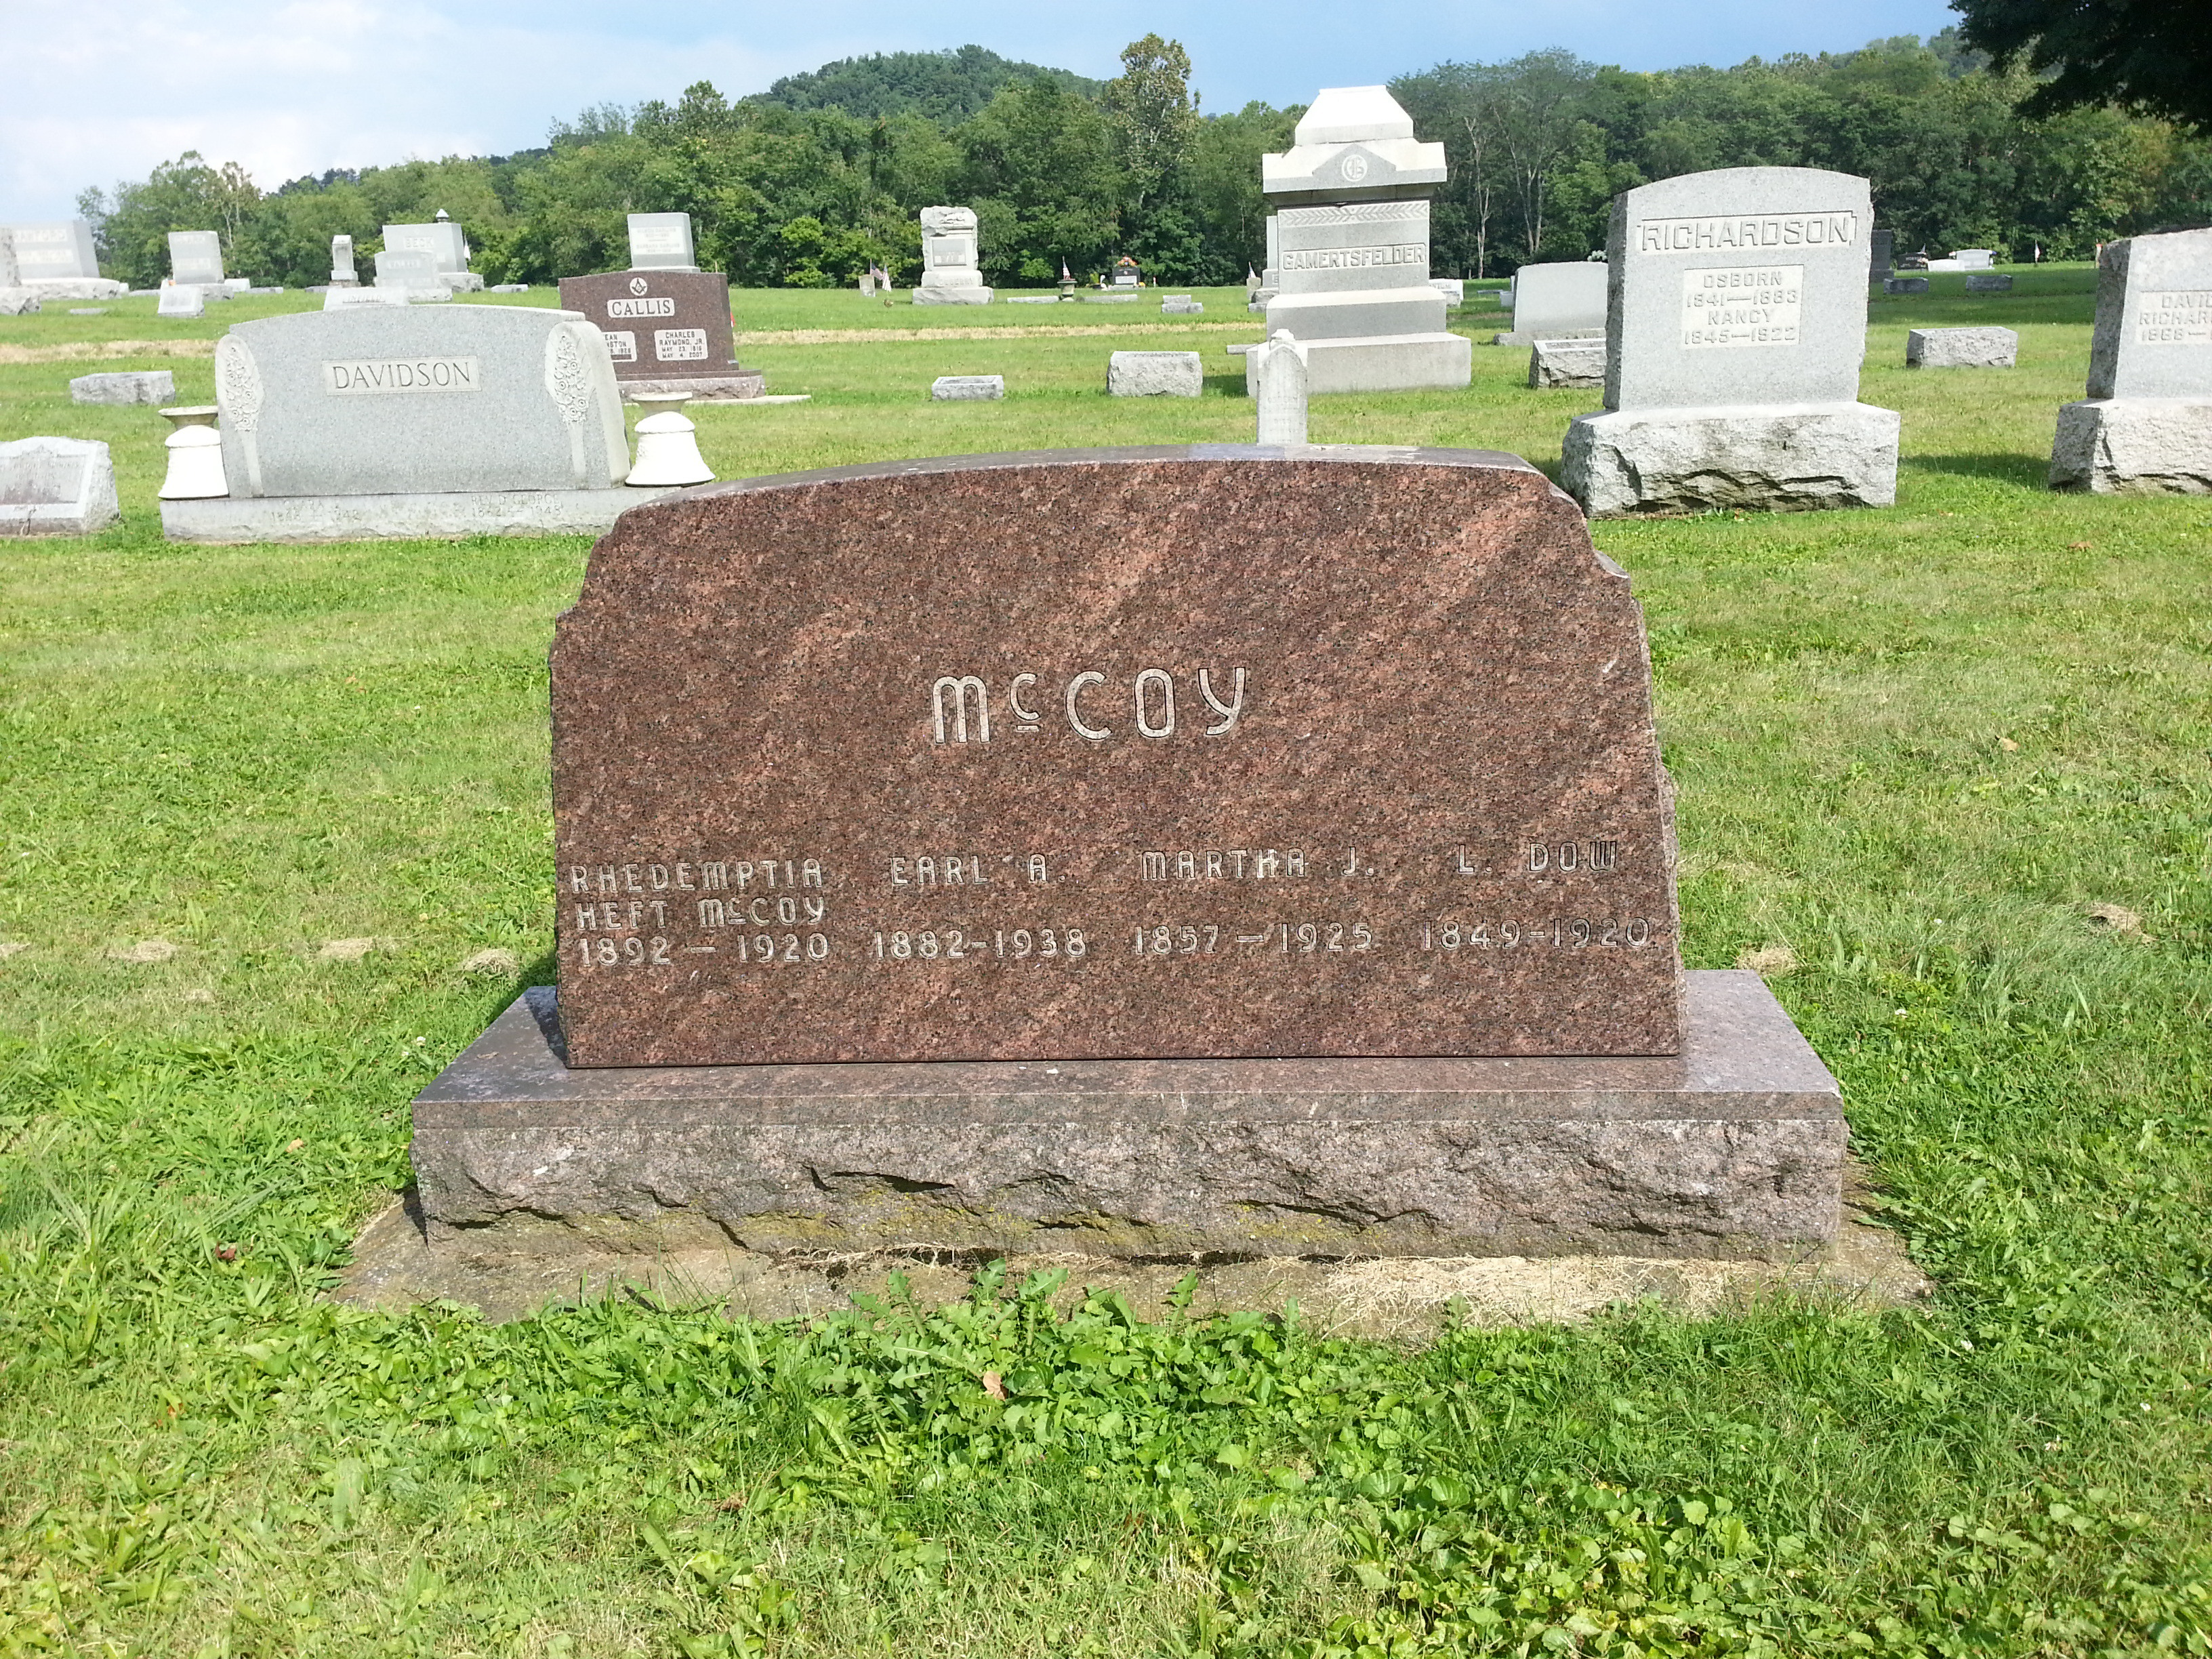 Lorenzo Dow McCoy